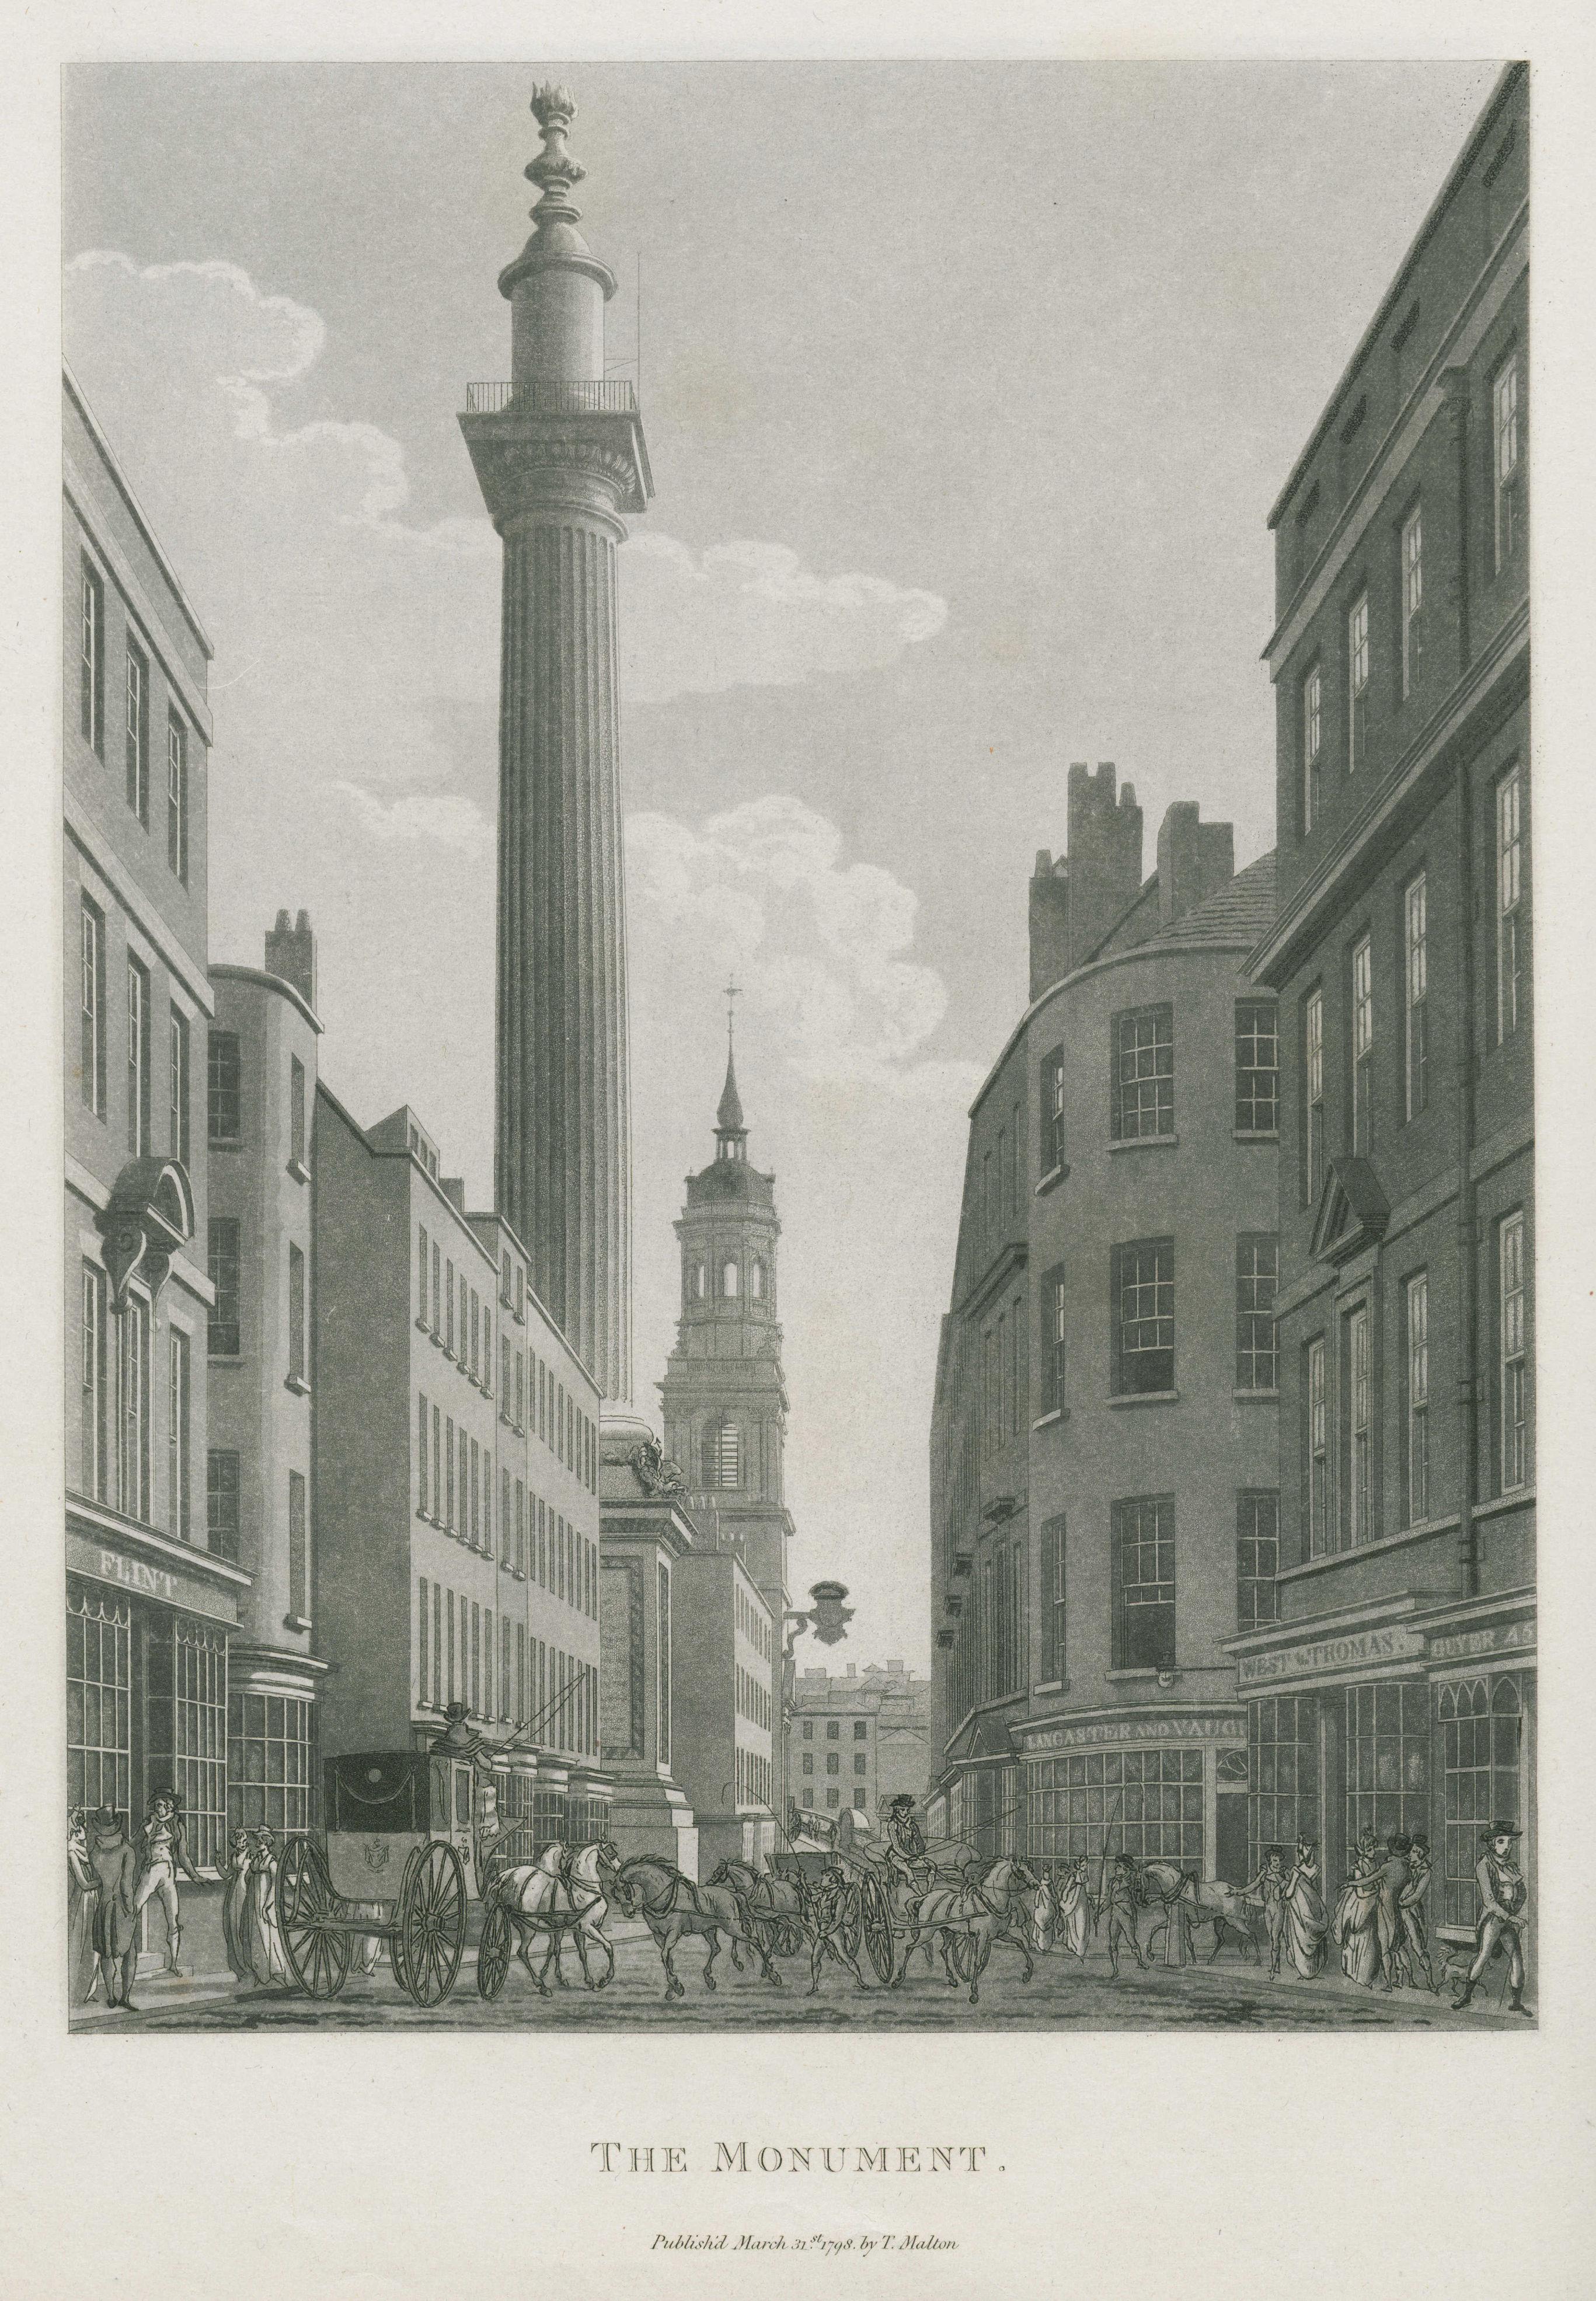 074 - Malton - The Monument